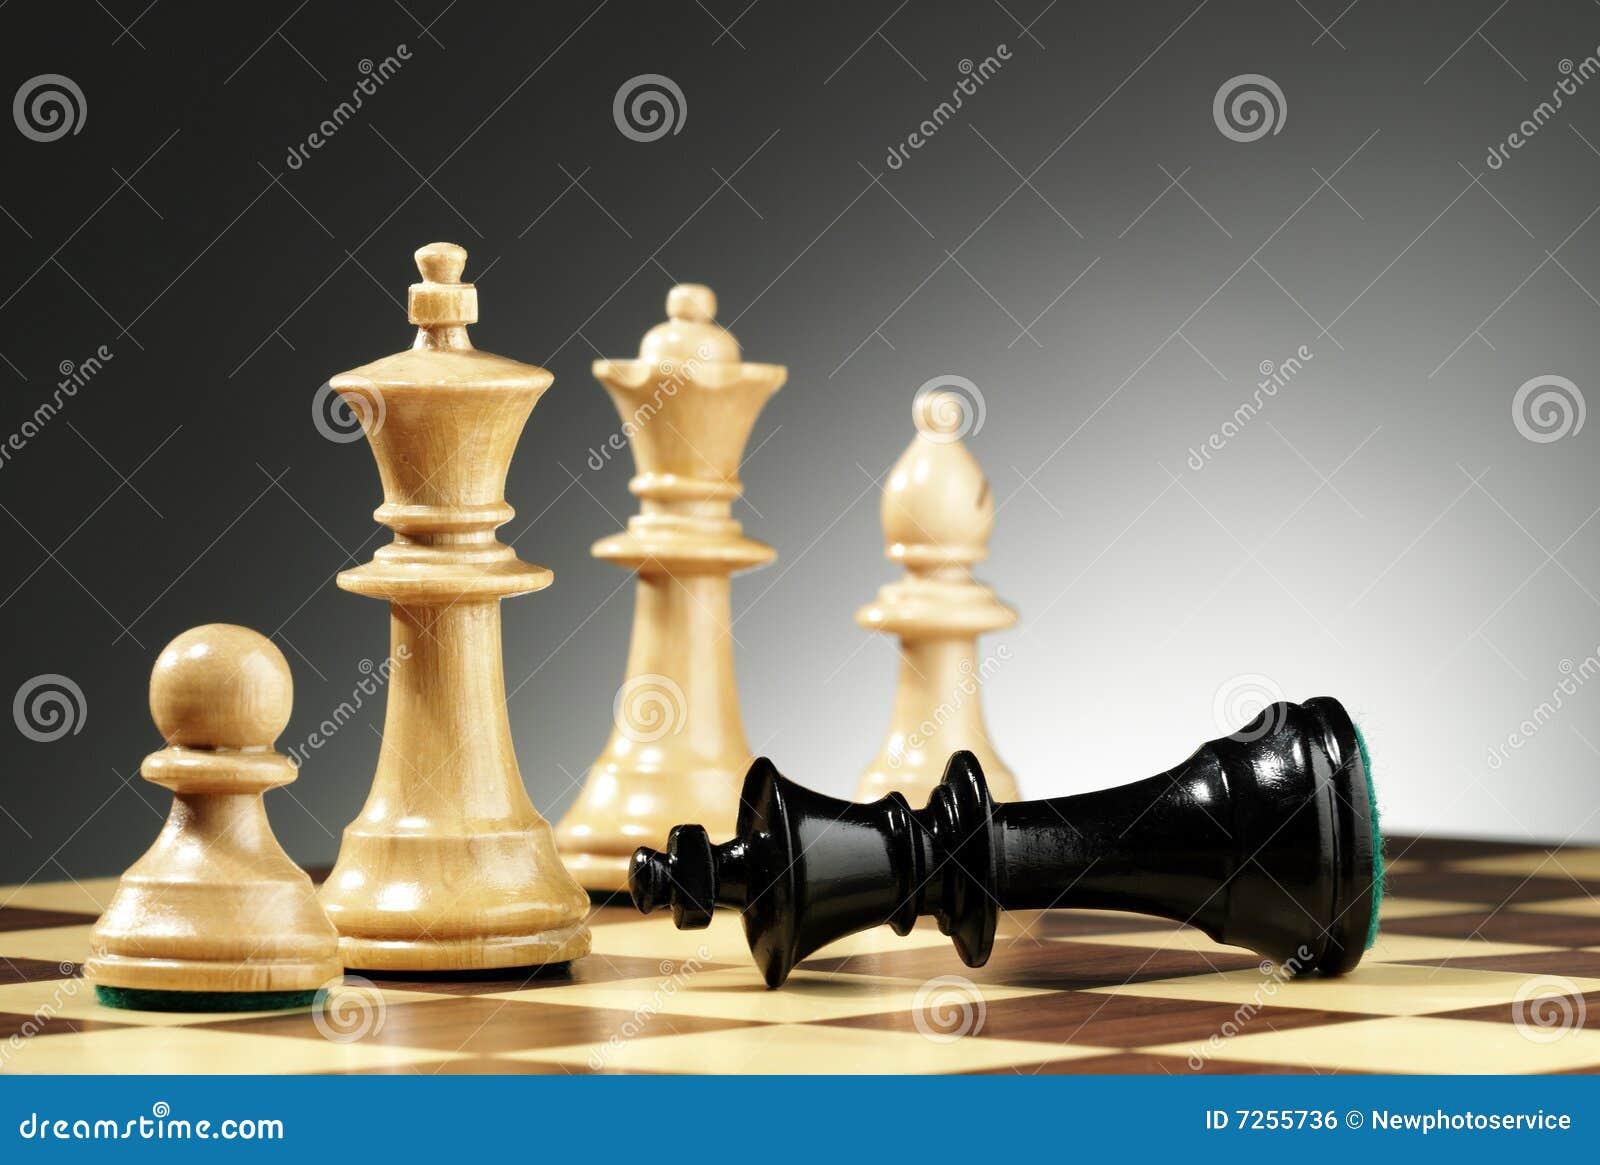 Chess Endgames | 10 Principles for Beginners - Chess.com